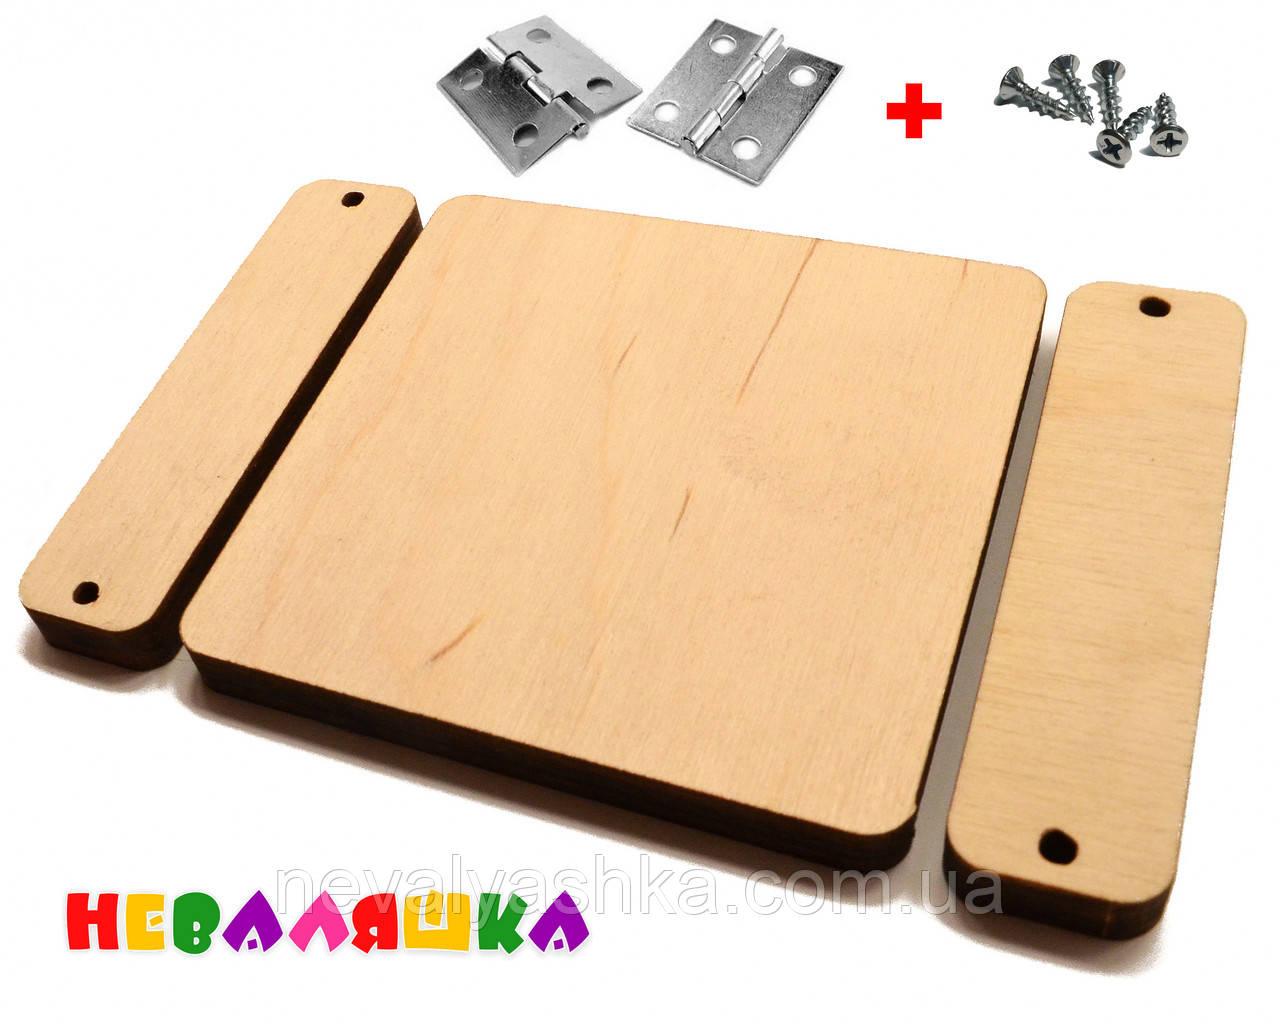 Заготовка для Бизиборда Деревянная Дверка Толстая 8 мм / 8 см + Петли Шурупы, Дверца Дерев'яні Двері Бізіборда